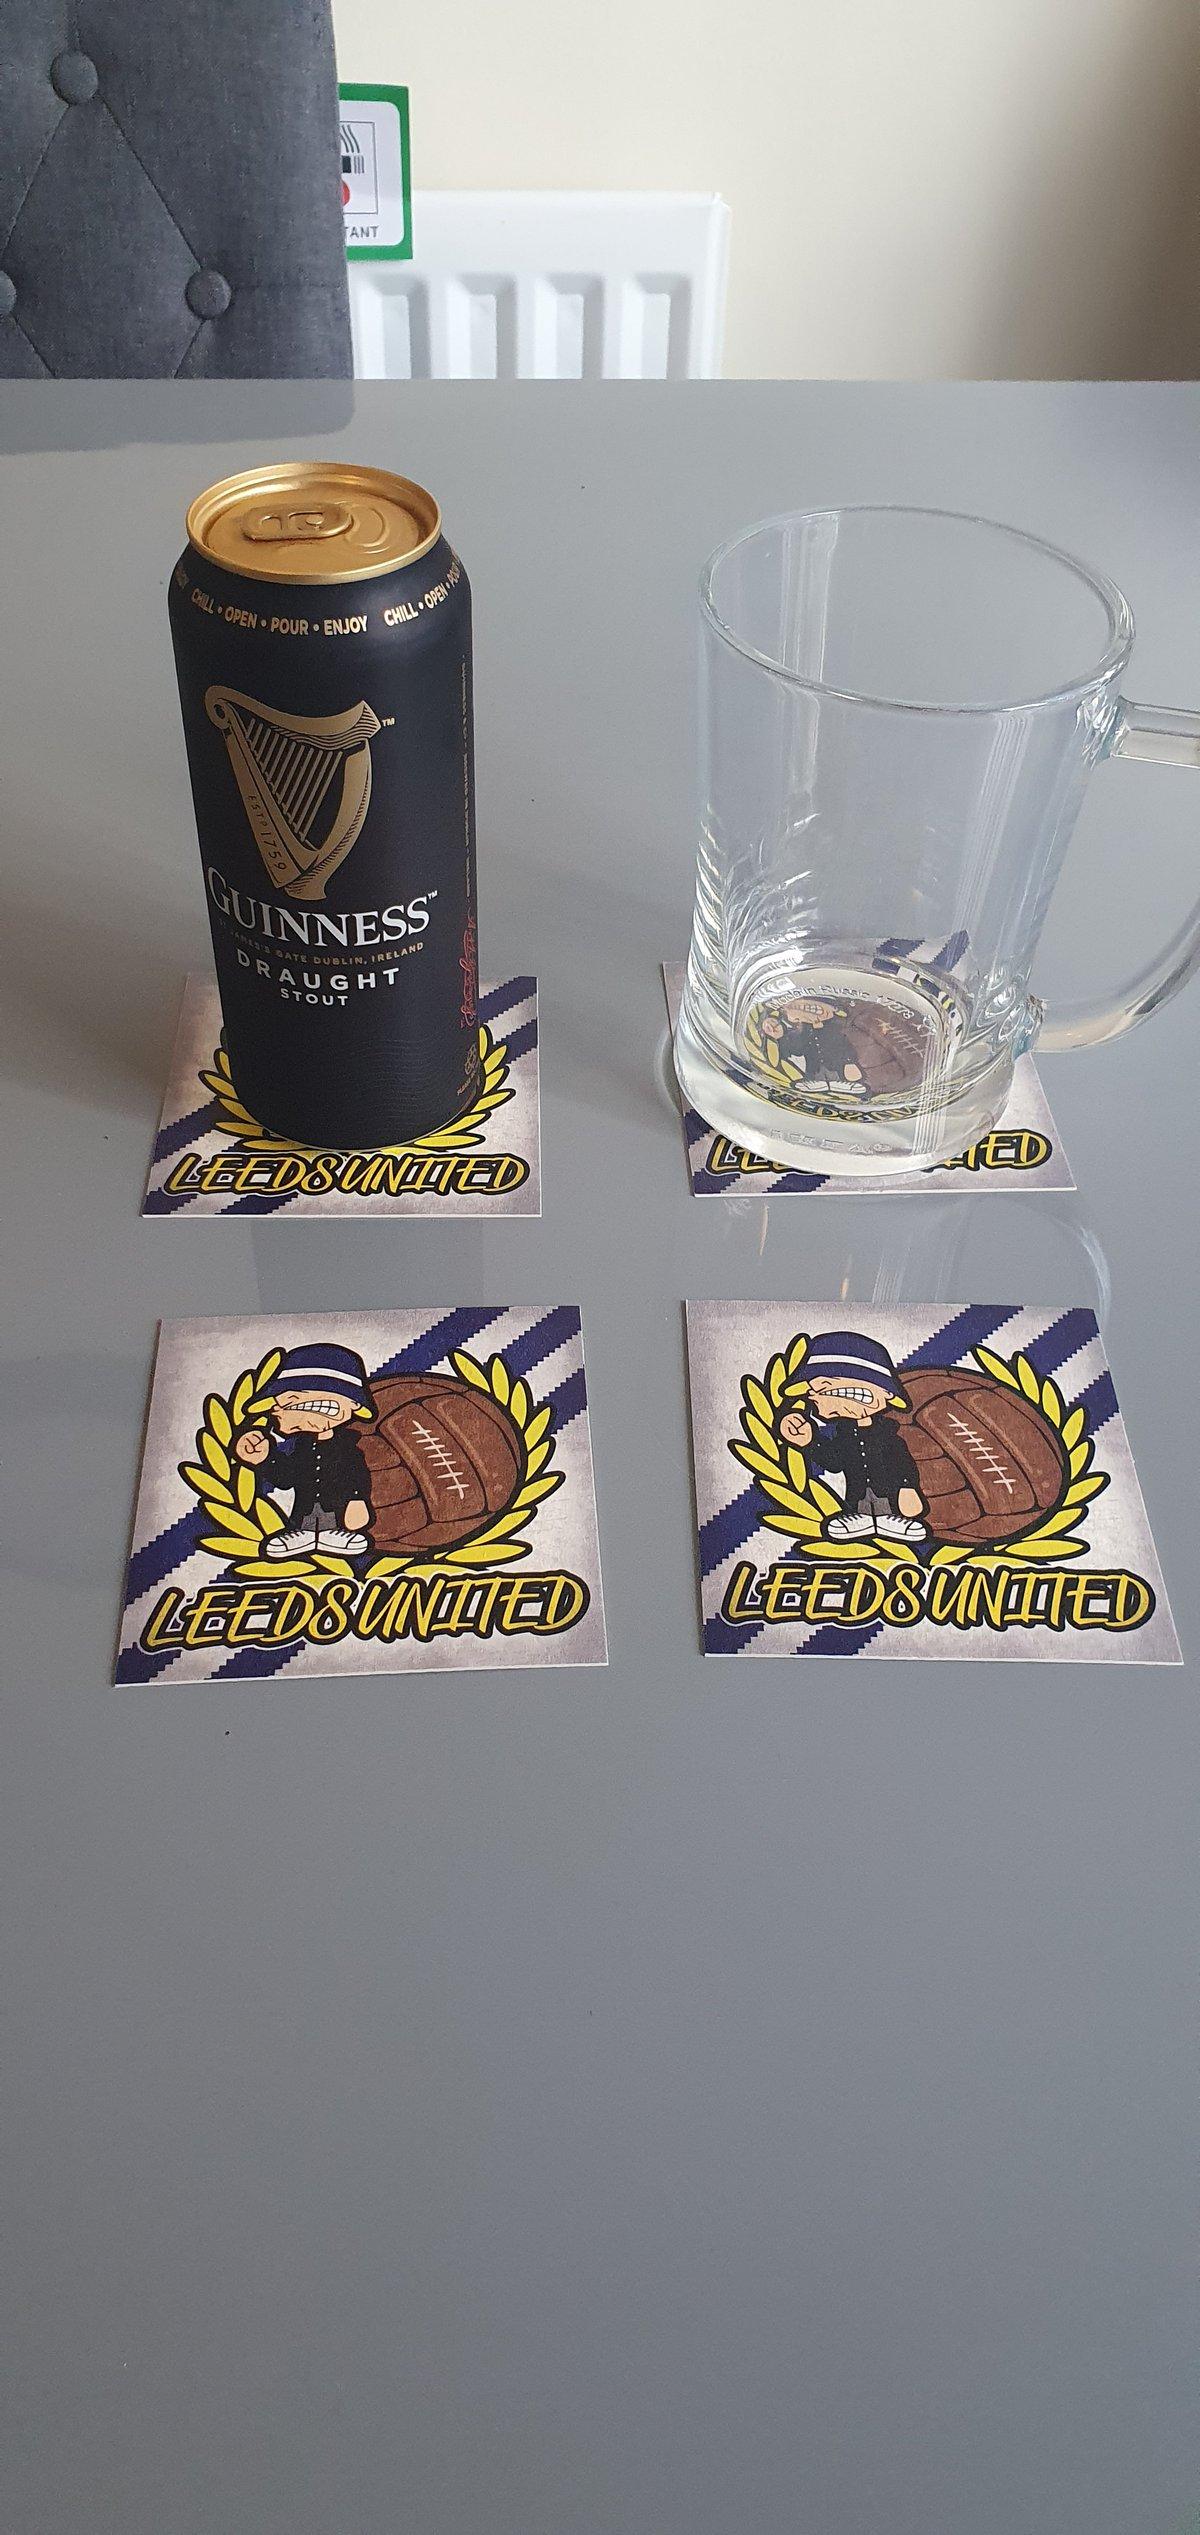 Pack of 10 10x10cm Leeds United football beer mats.